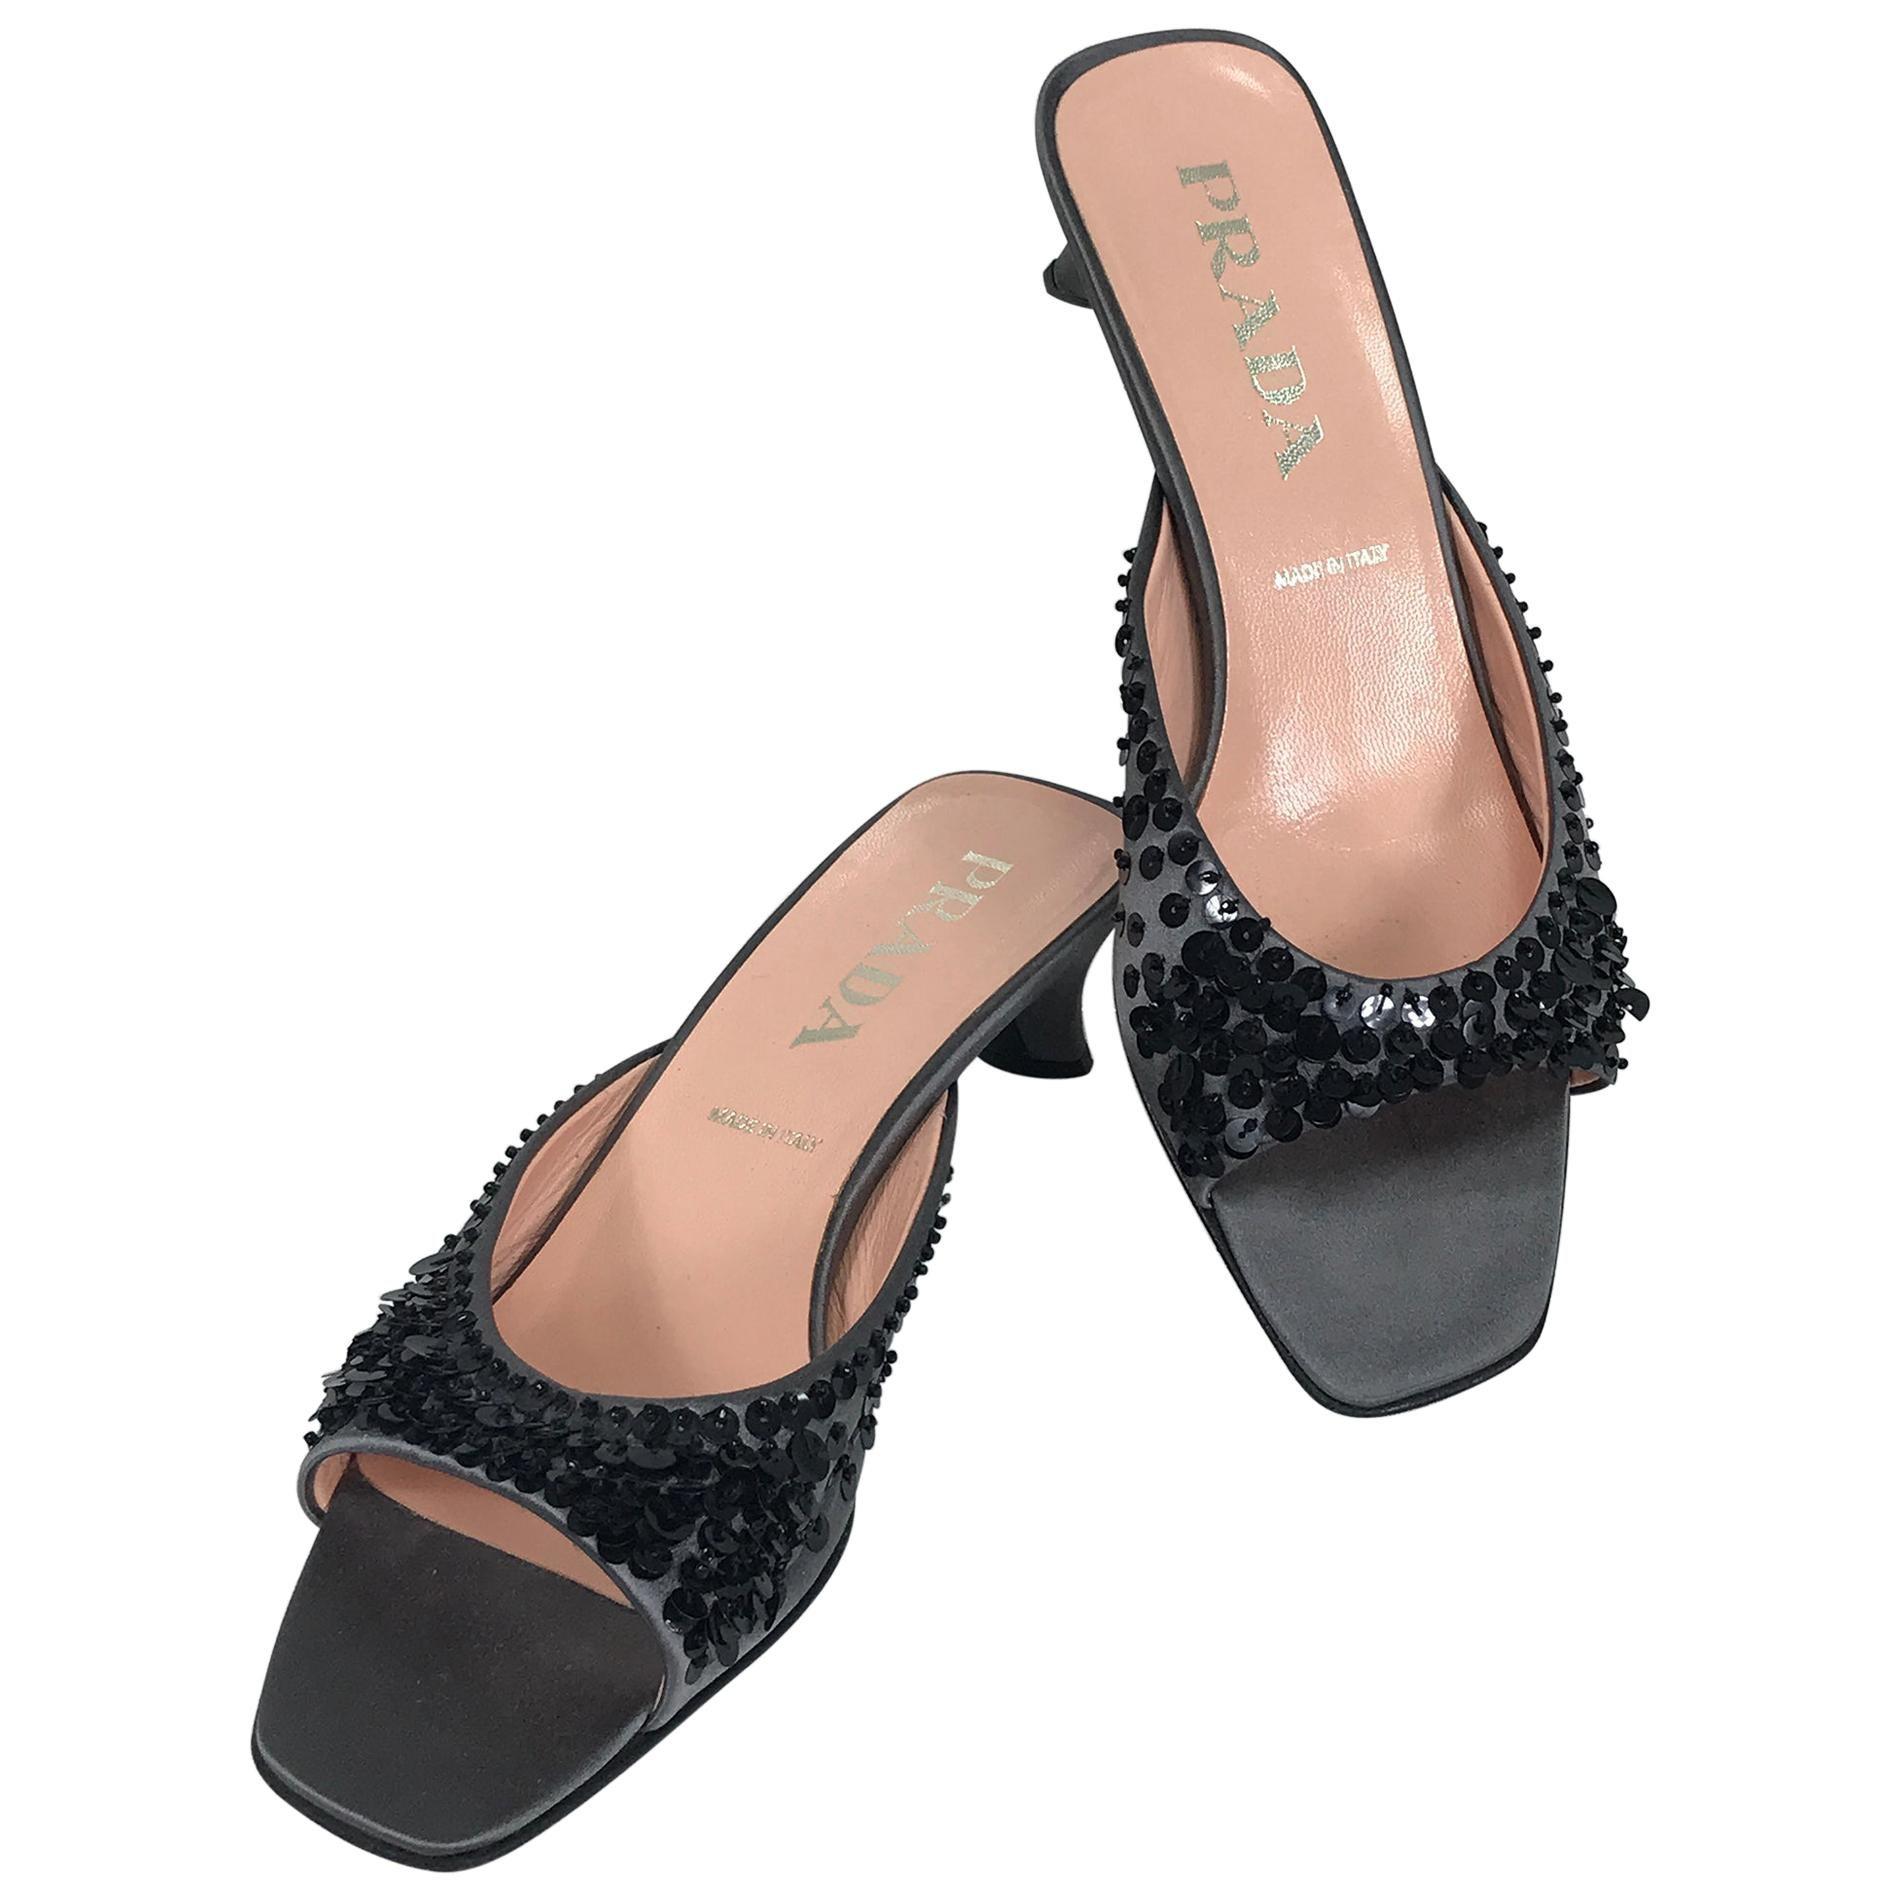 Prada Silver Satin & Black Sequin Open Toe Under Slung Heel Mules 38